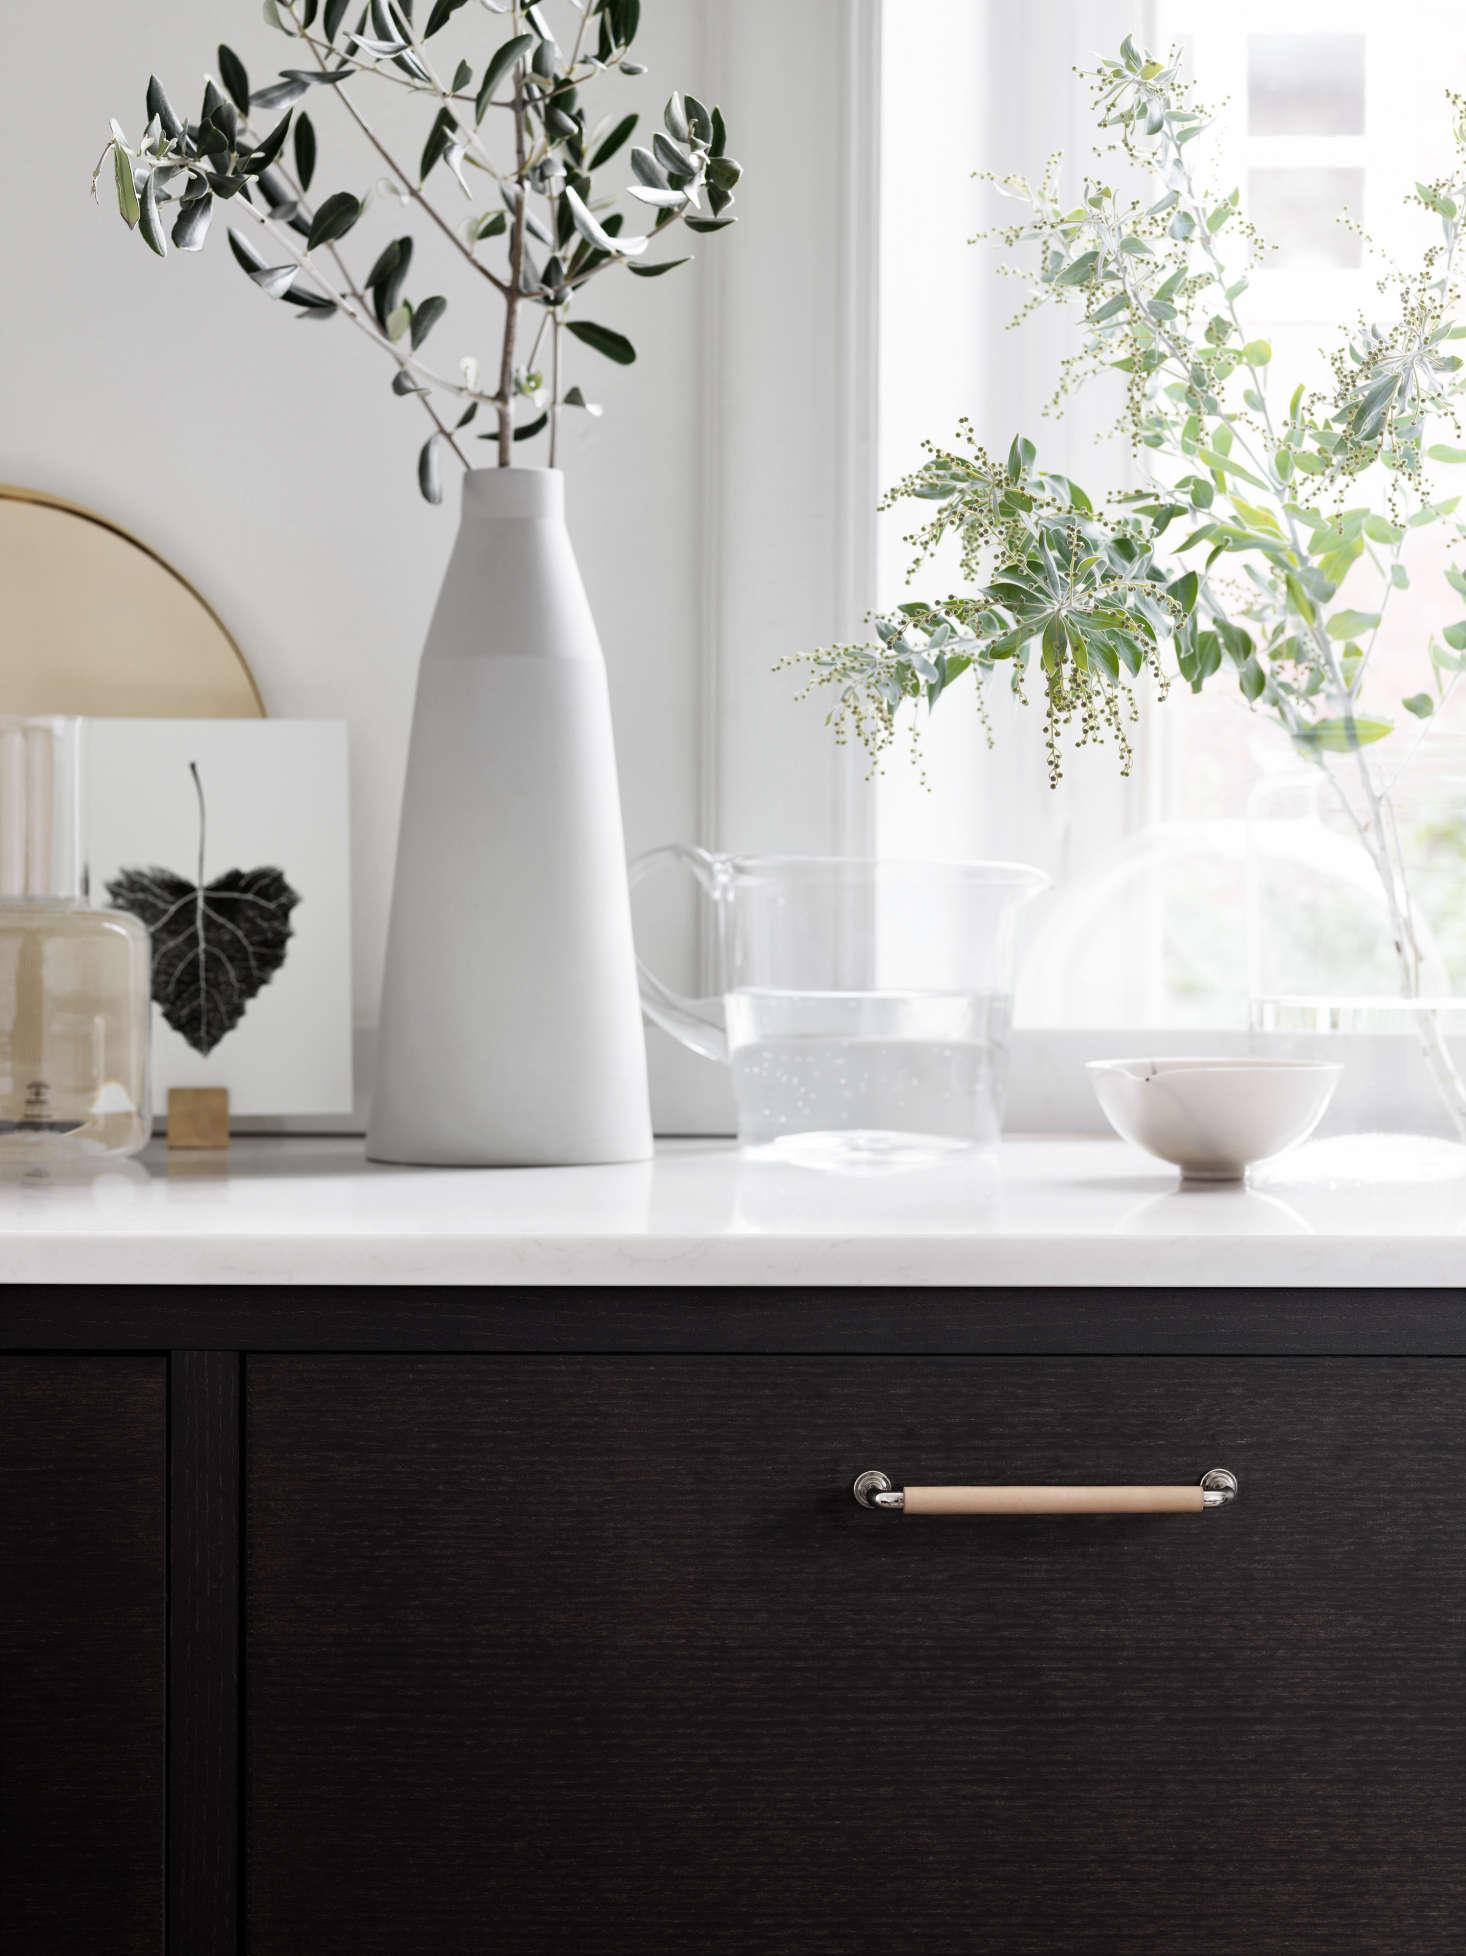 Bistro-kitchen-in-ash-brown-by-Ballingslov-of-Sweden-Remodelista-9